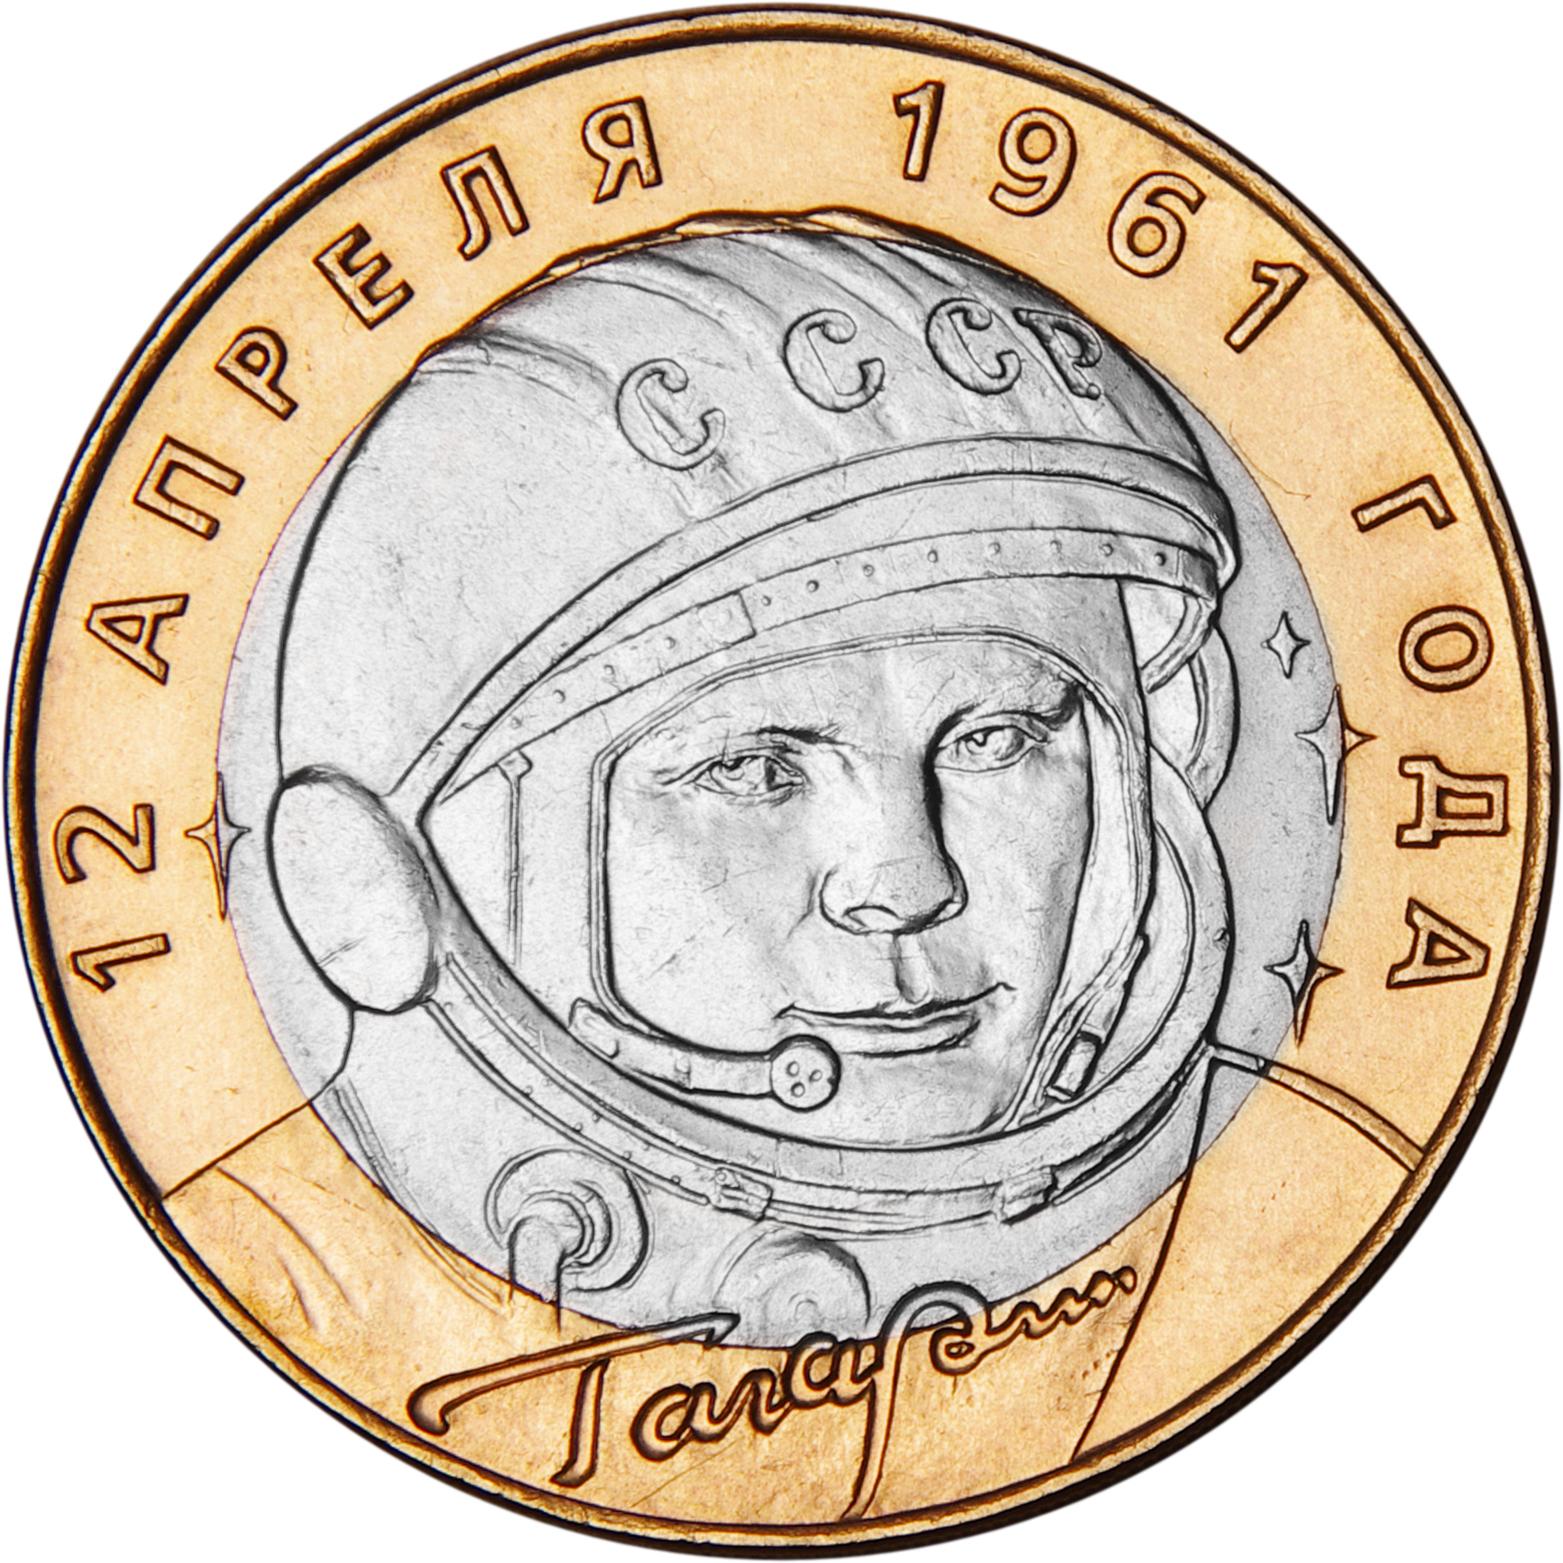 Yuri Gagarin | Military Wiki | FANDOM powered by Wikia